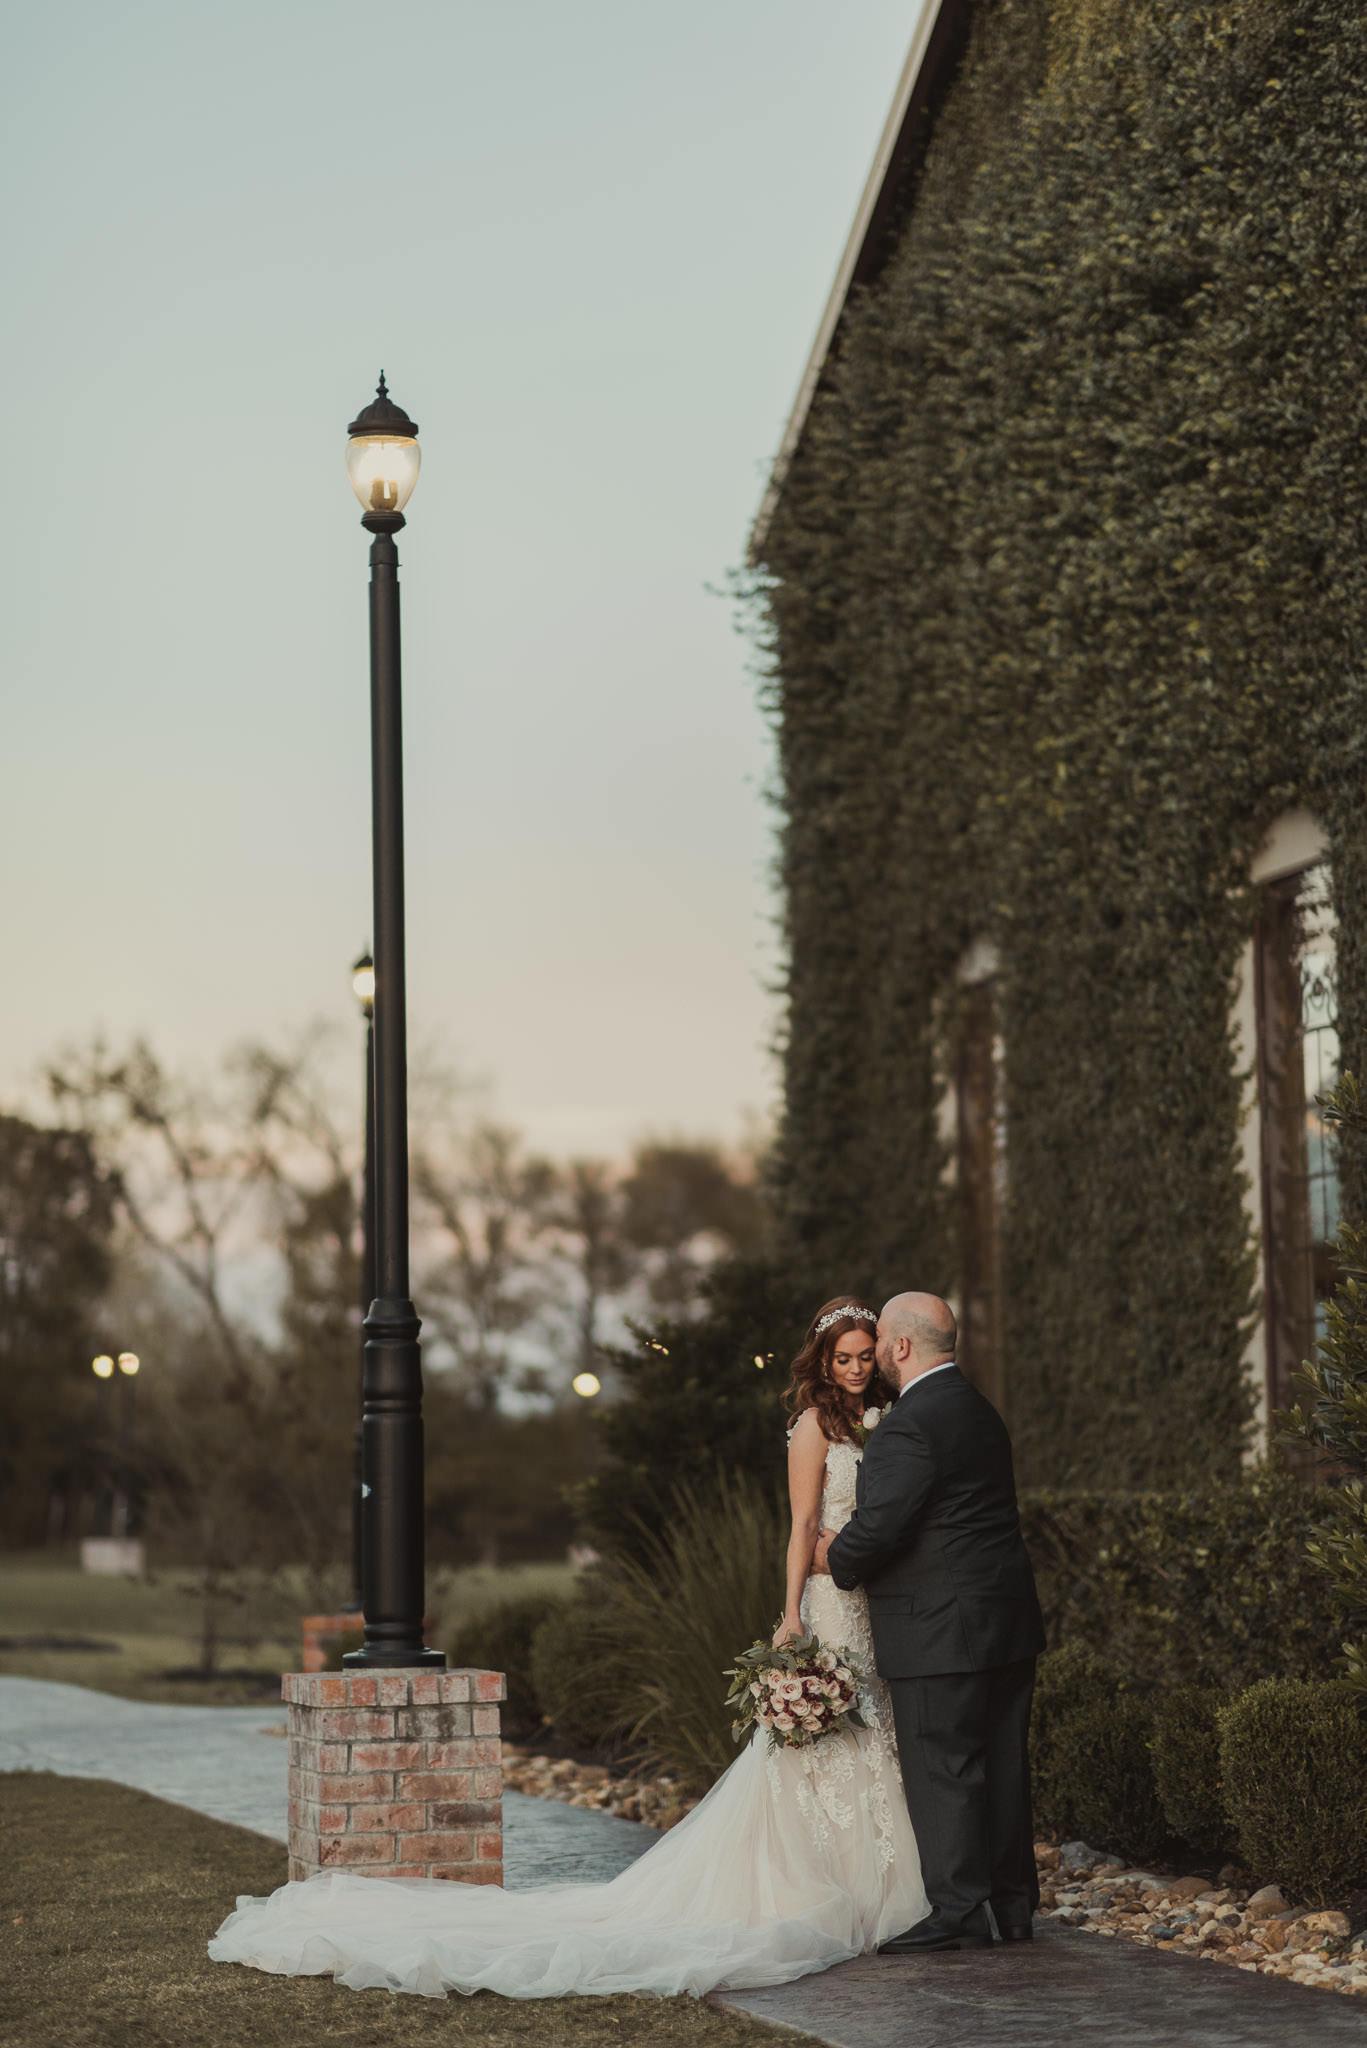 Cynthia-Curtis-Olde-Dobbine-Station-Houston-Wedding-Photographer-sm-77.jpg